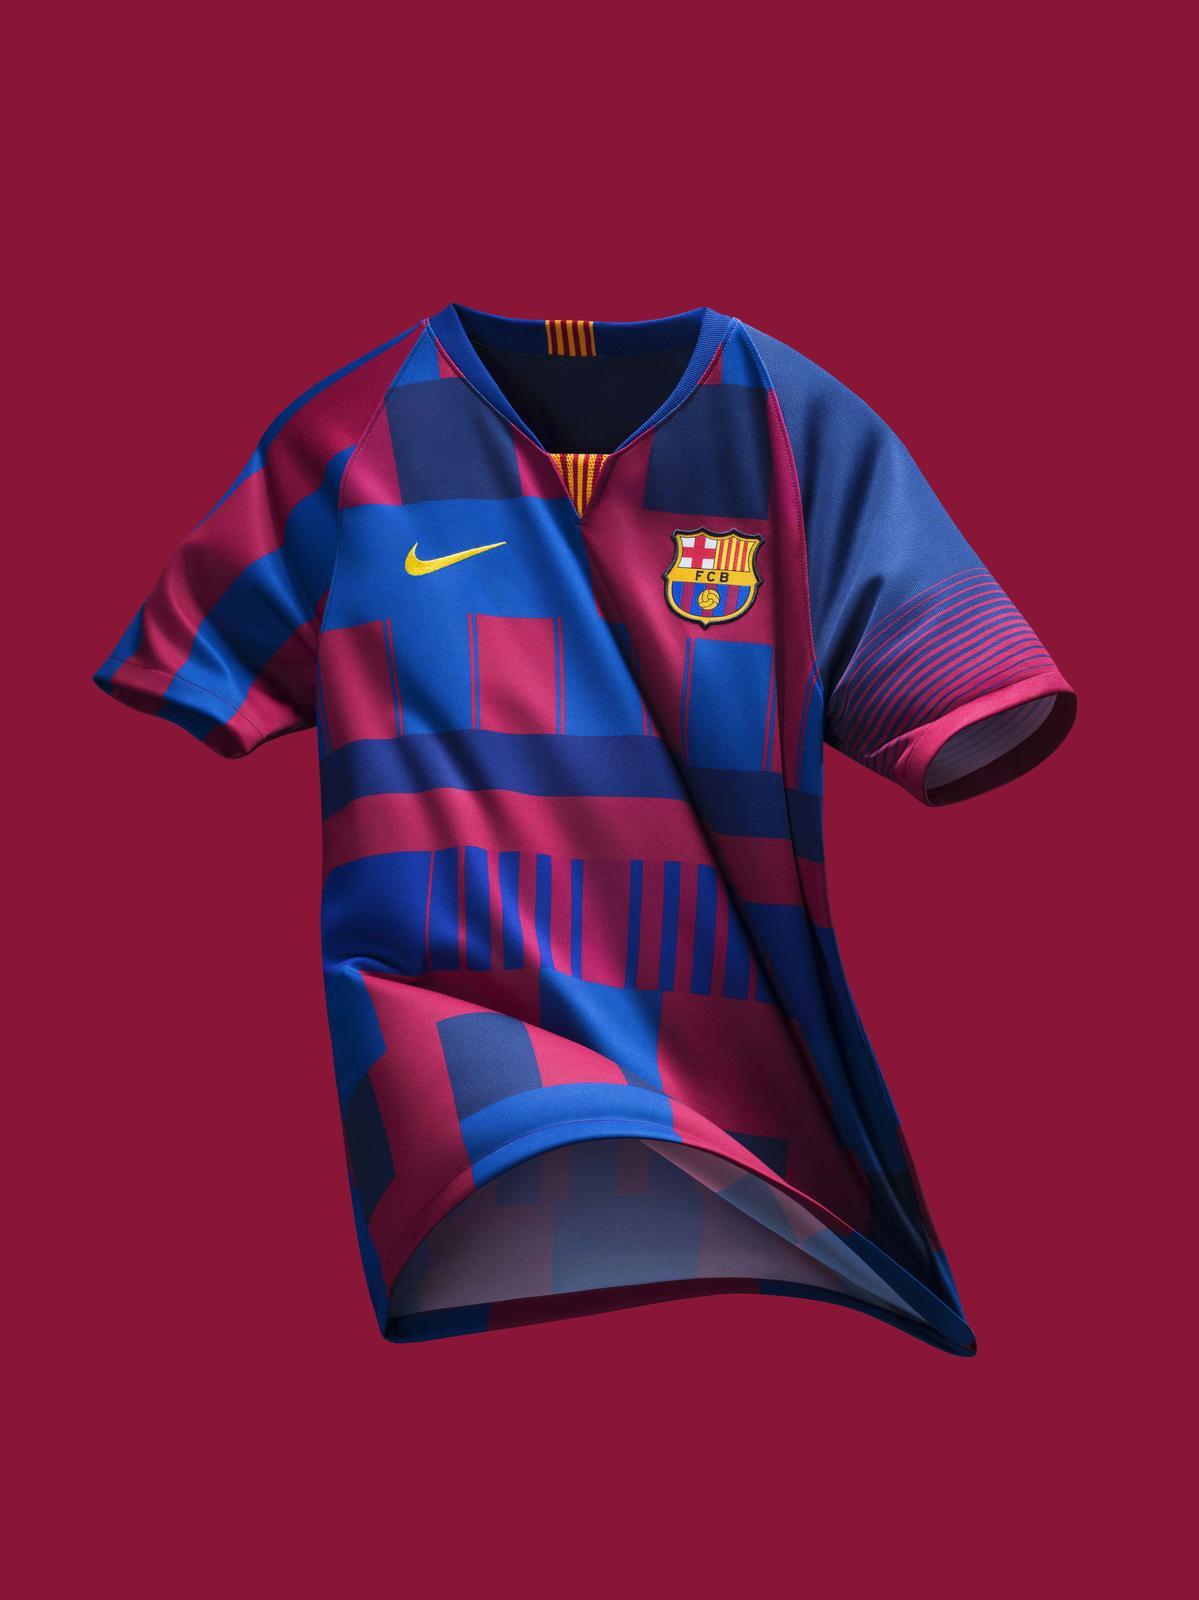 X 20th 1819 Barcelona Mash Kits Anniversary Up Nike Jersey d7xx0wz